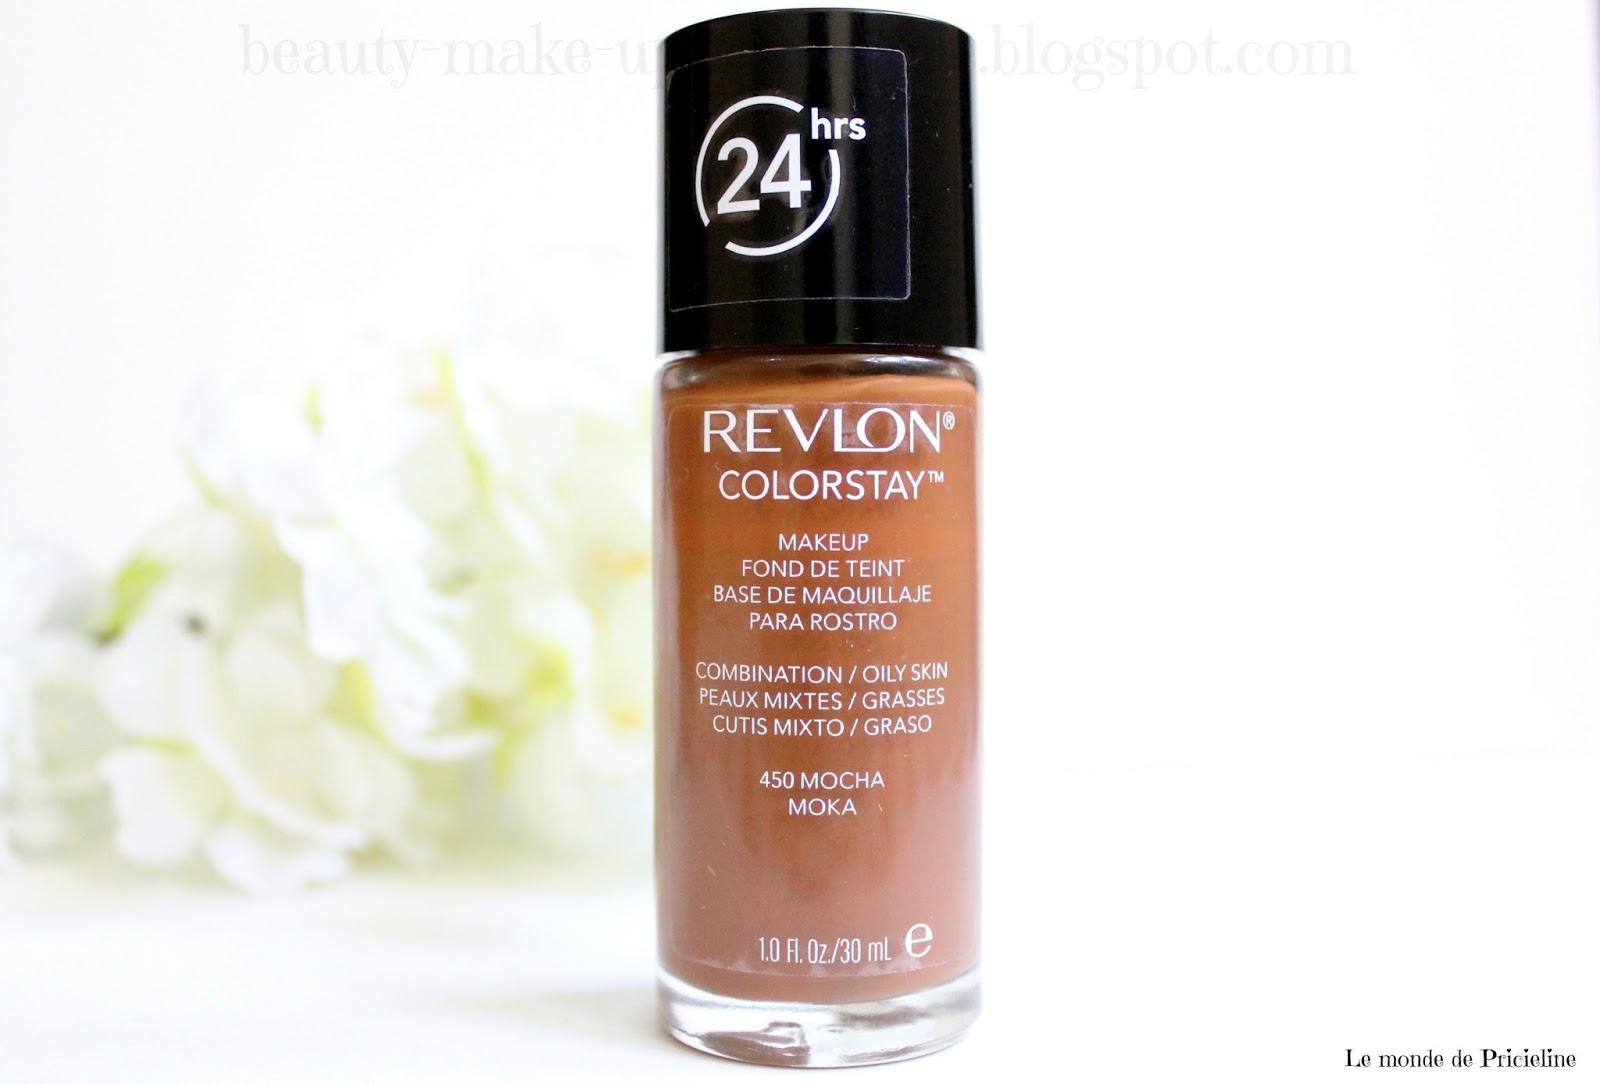 Revue du fond de teint Colorstay 24 heures de Revlon